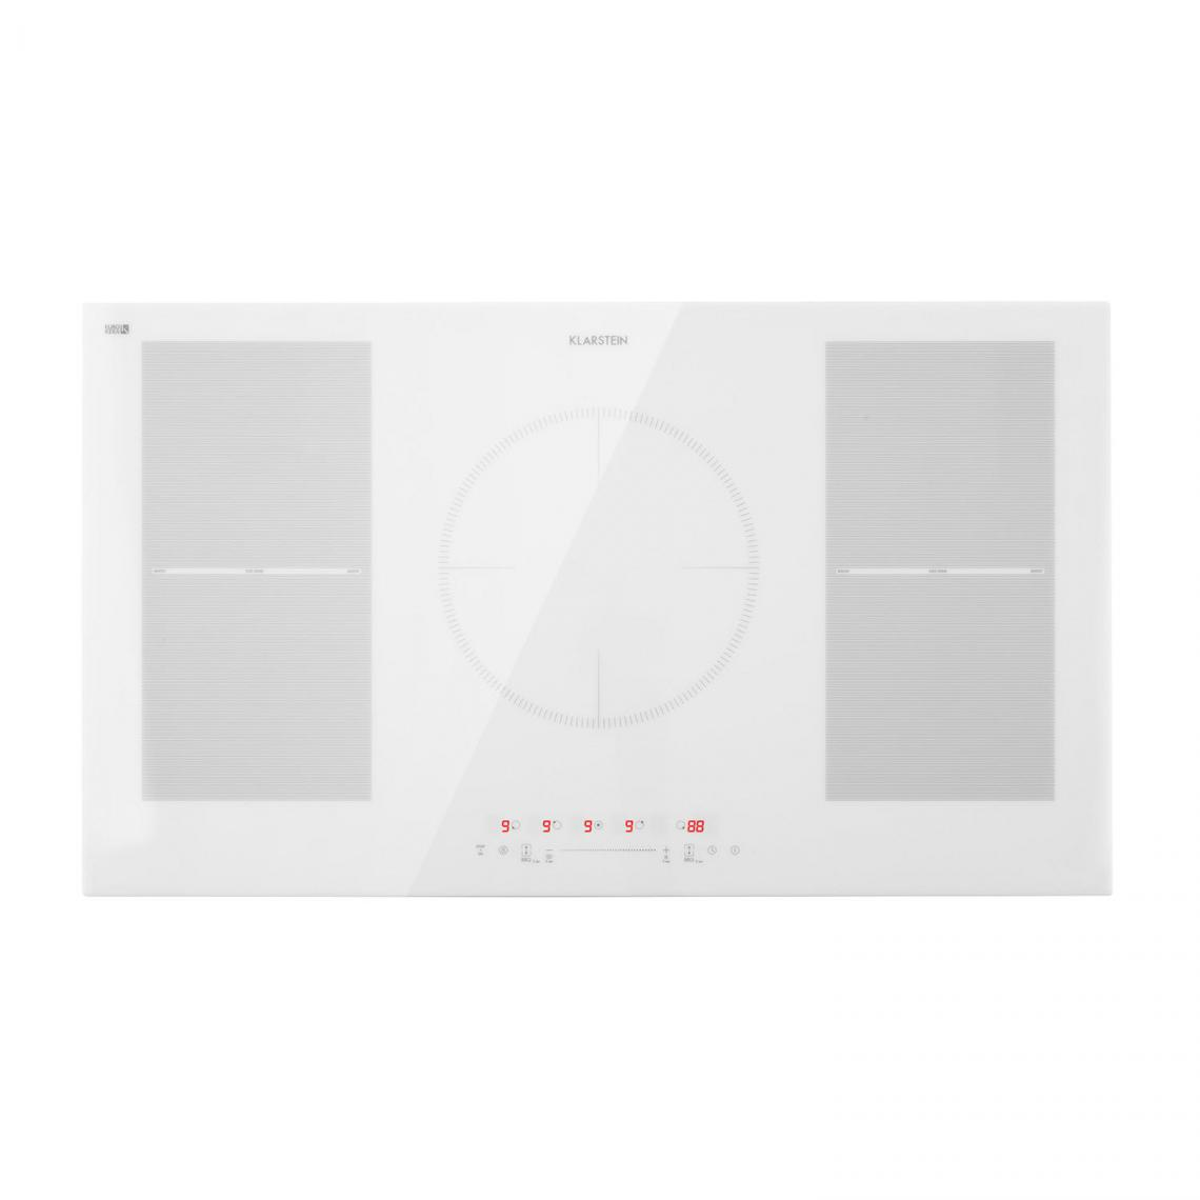 Klarstein Plaque de cuisson à induction - Klarstein Delicatessa 90 Flex - Encastrable, 5 zones, 7000W max. - Blanc